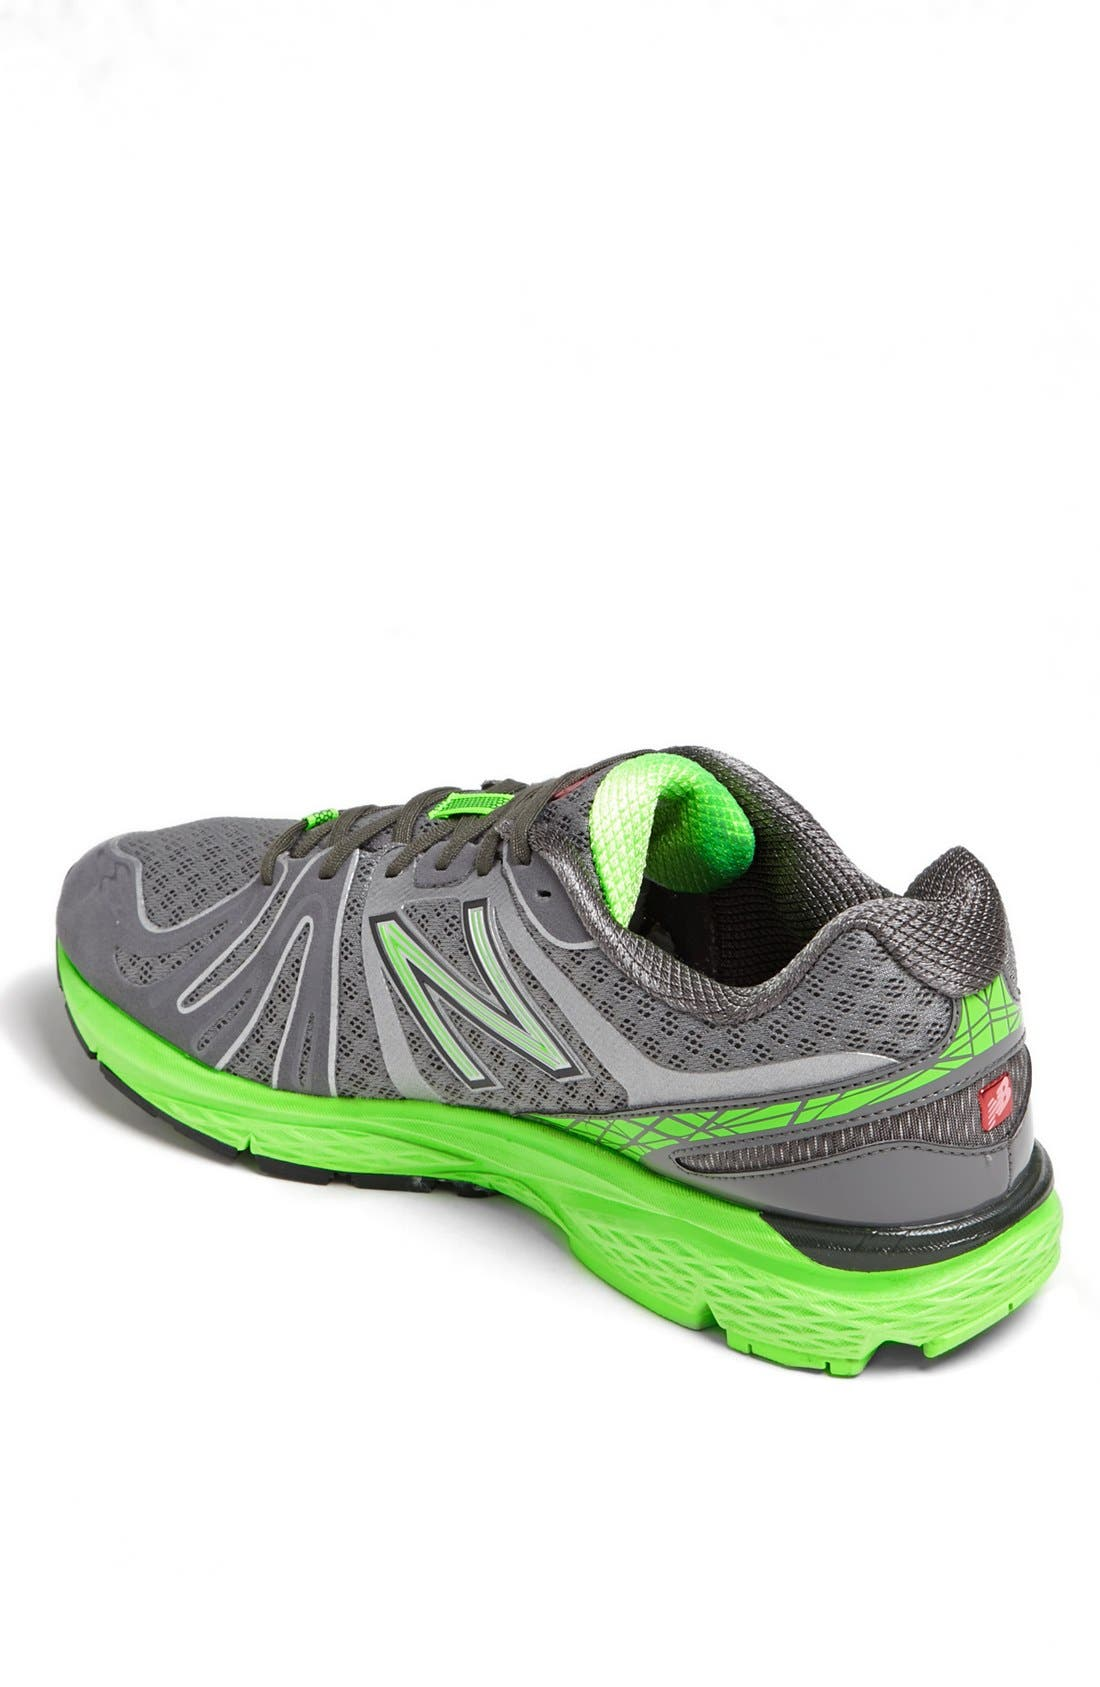 Alternate Image 2  - New Balance '790' Running Shoe (Men) (Online Only Color)